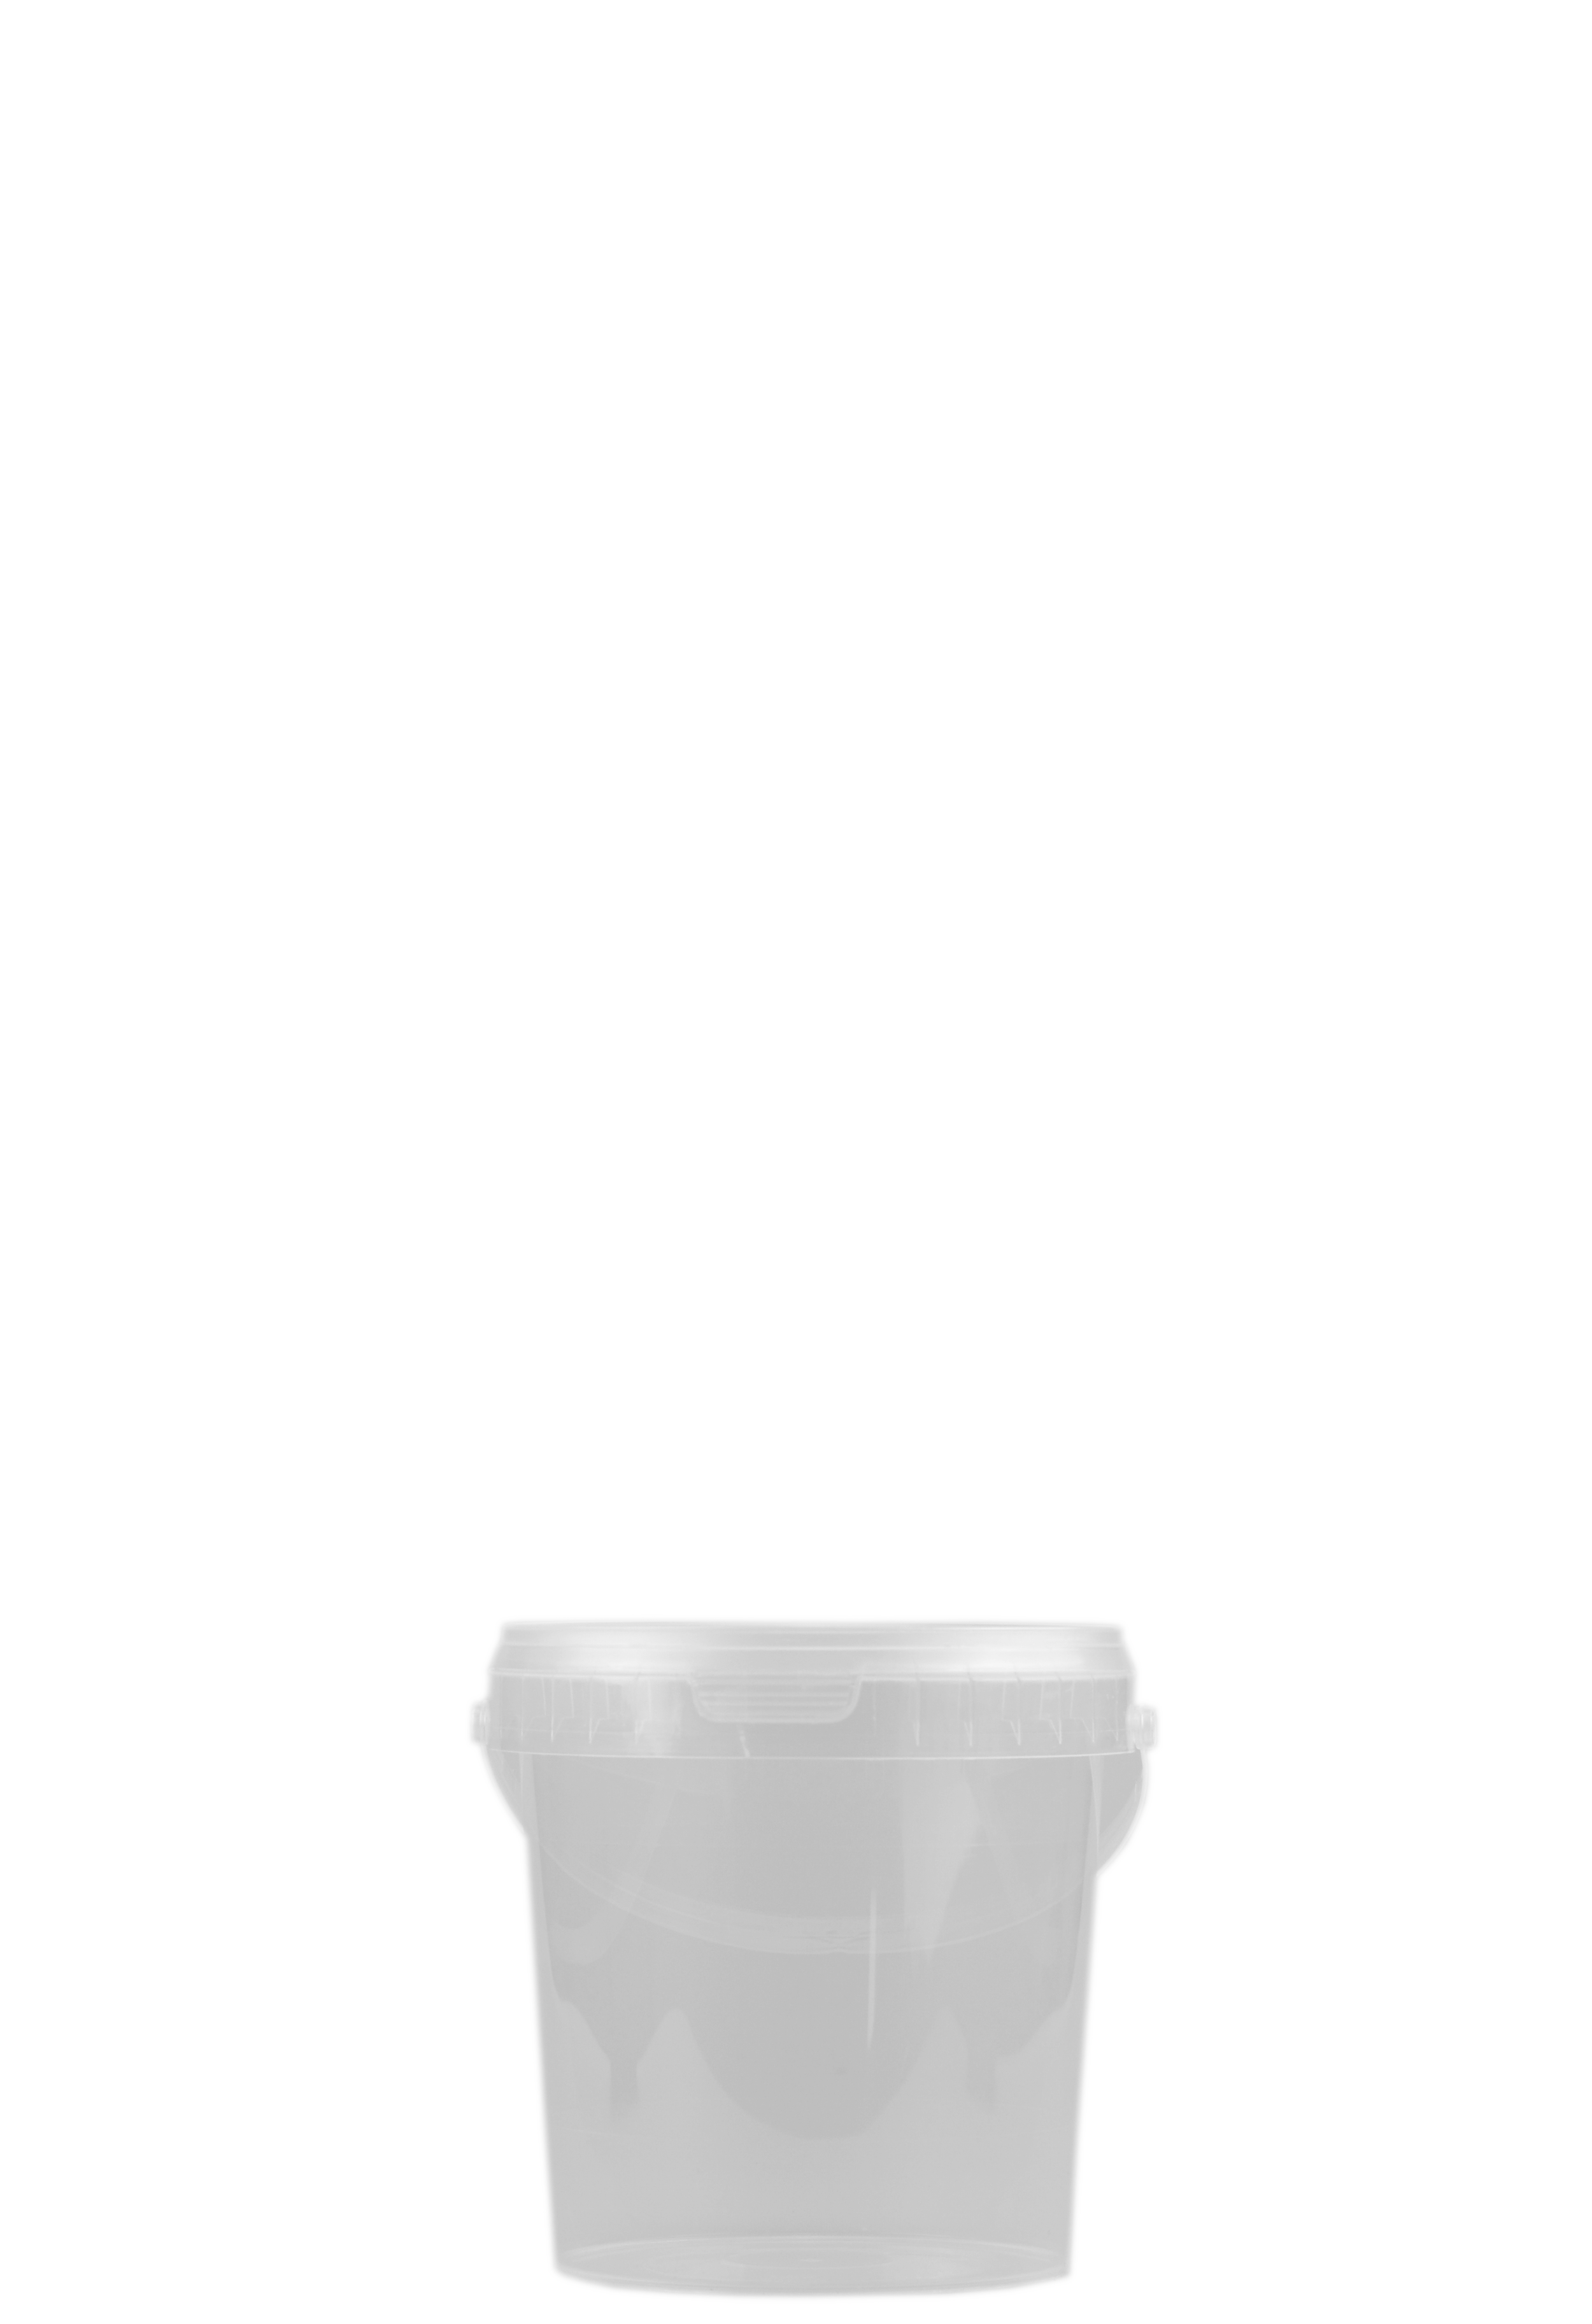 1.2 liter bucket